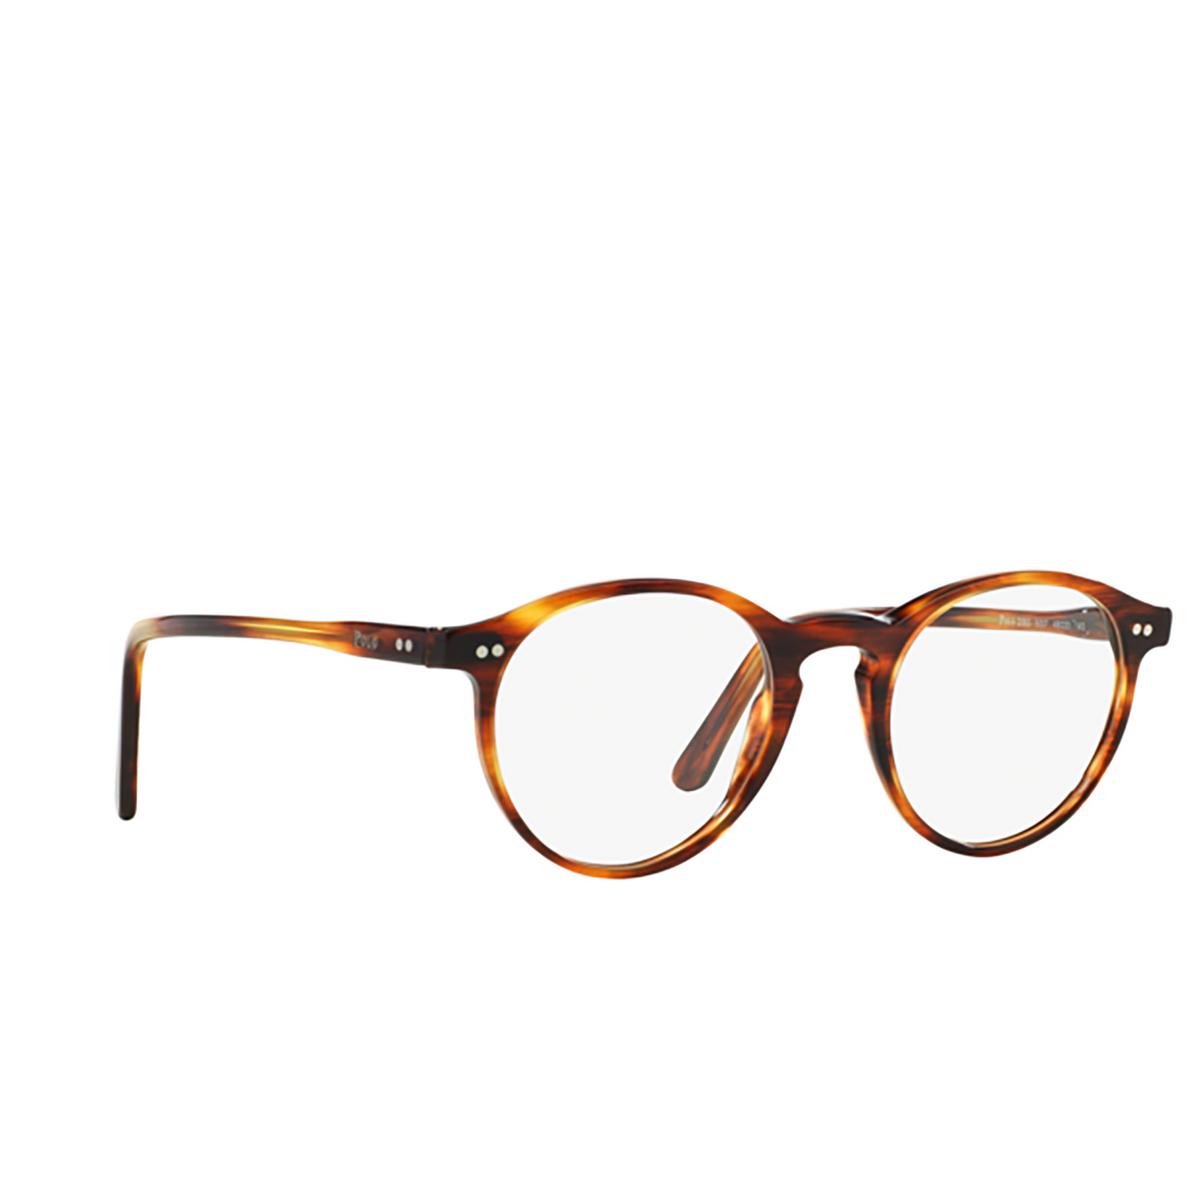 Polo Ralph Lauren® Round Eyeglasses: PH2083 color Shiny Striped Havana 5007.